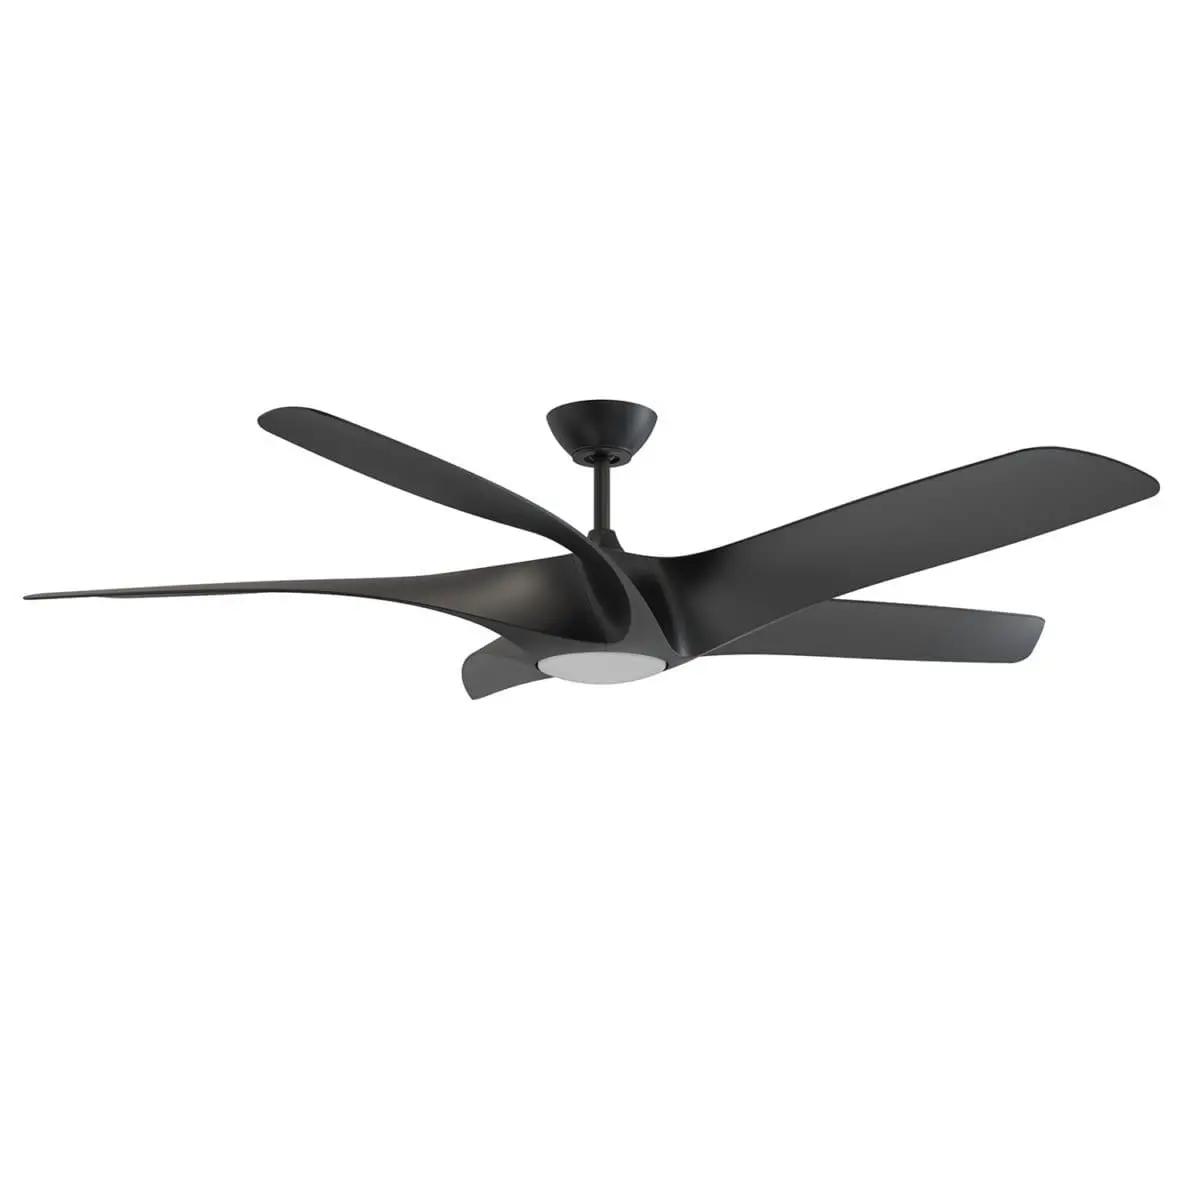 "148 AC23960 60"" in Black or Satin Nickle Regular Price $728.99 Sale Price $509.99"